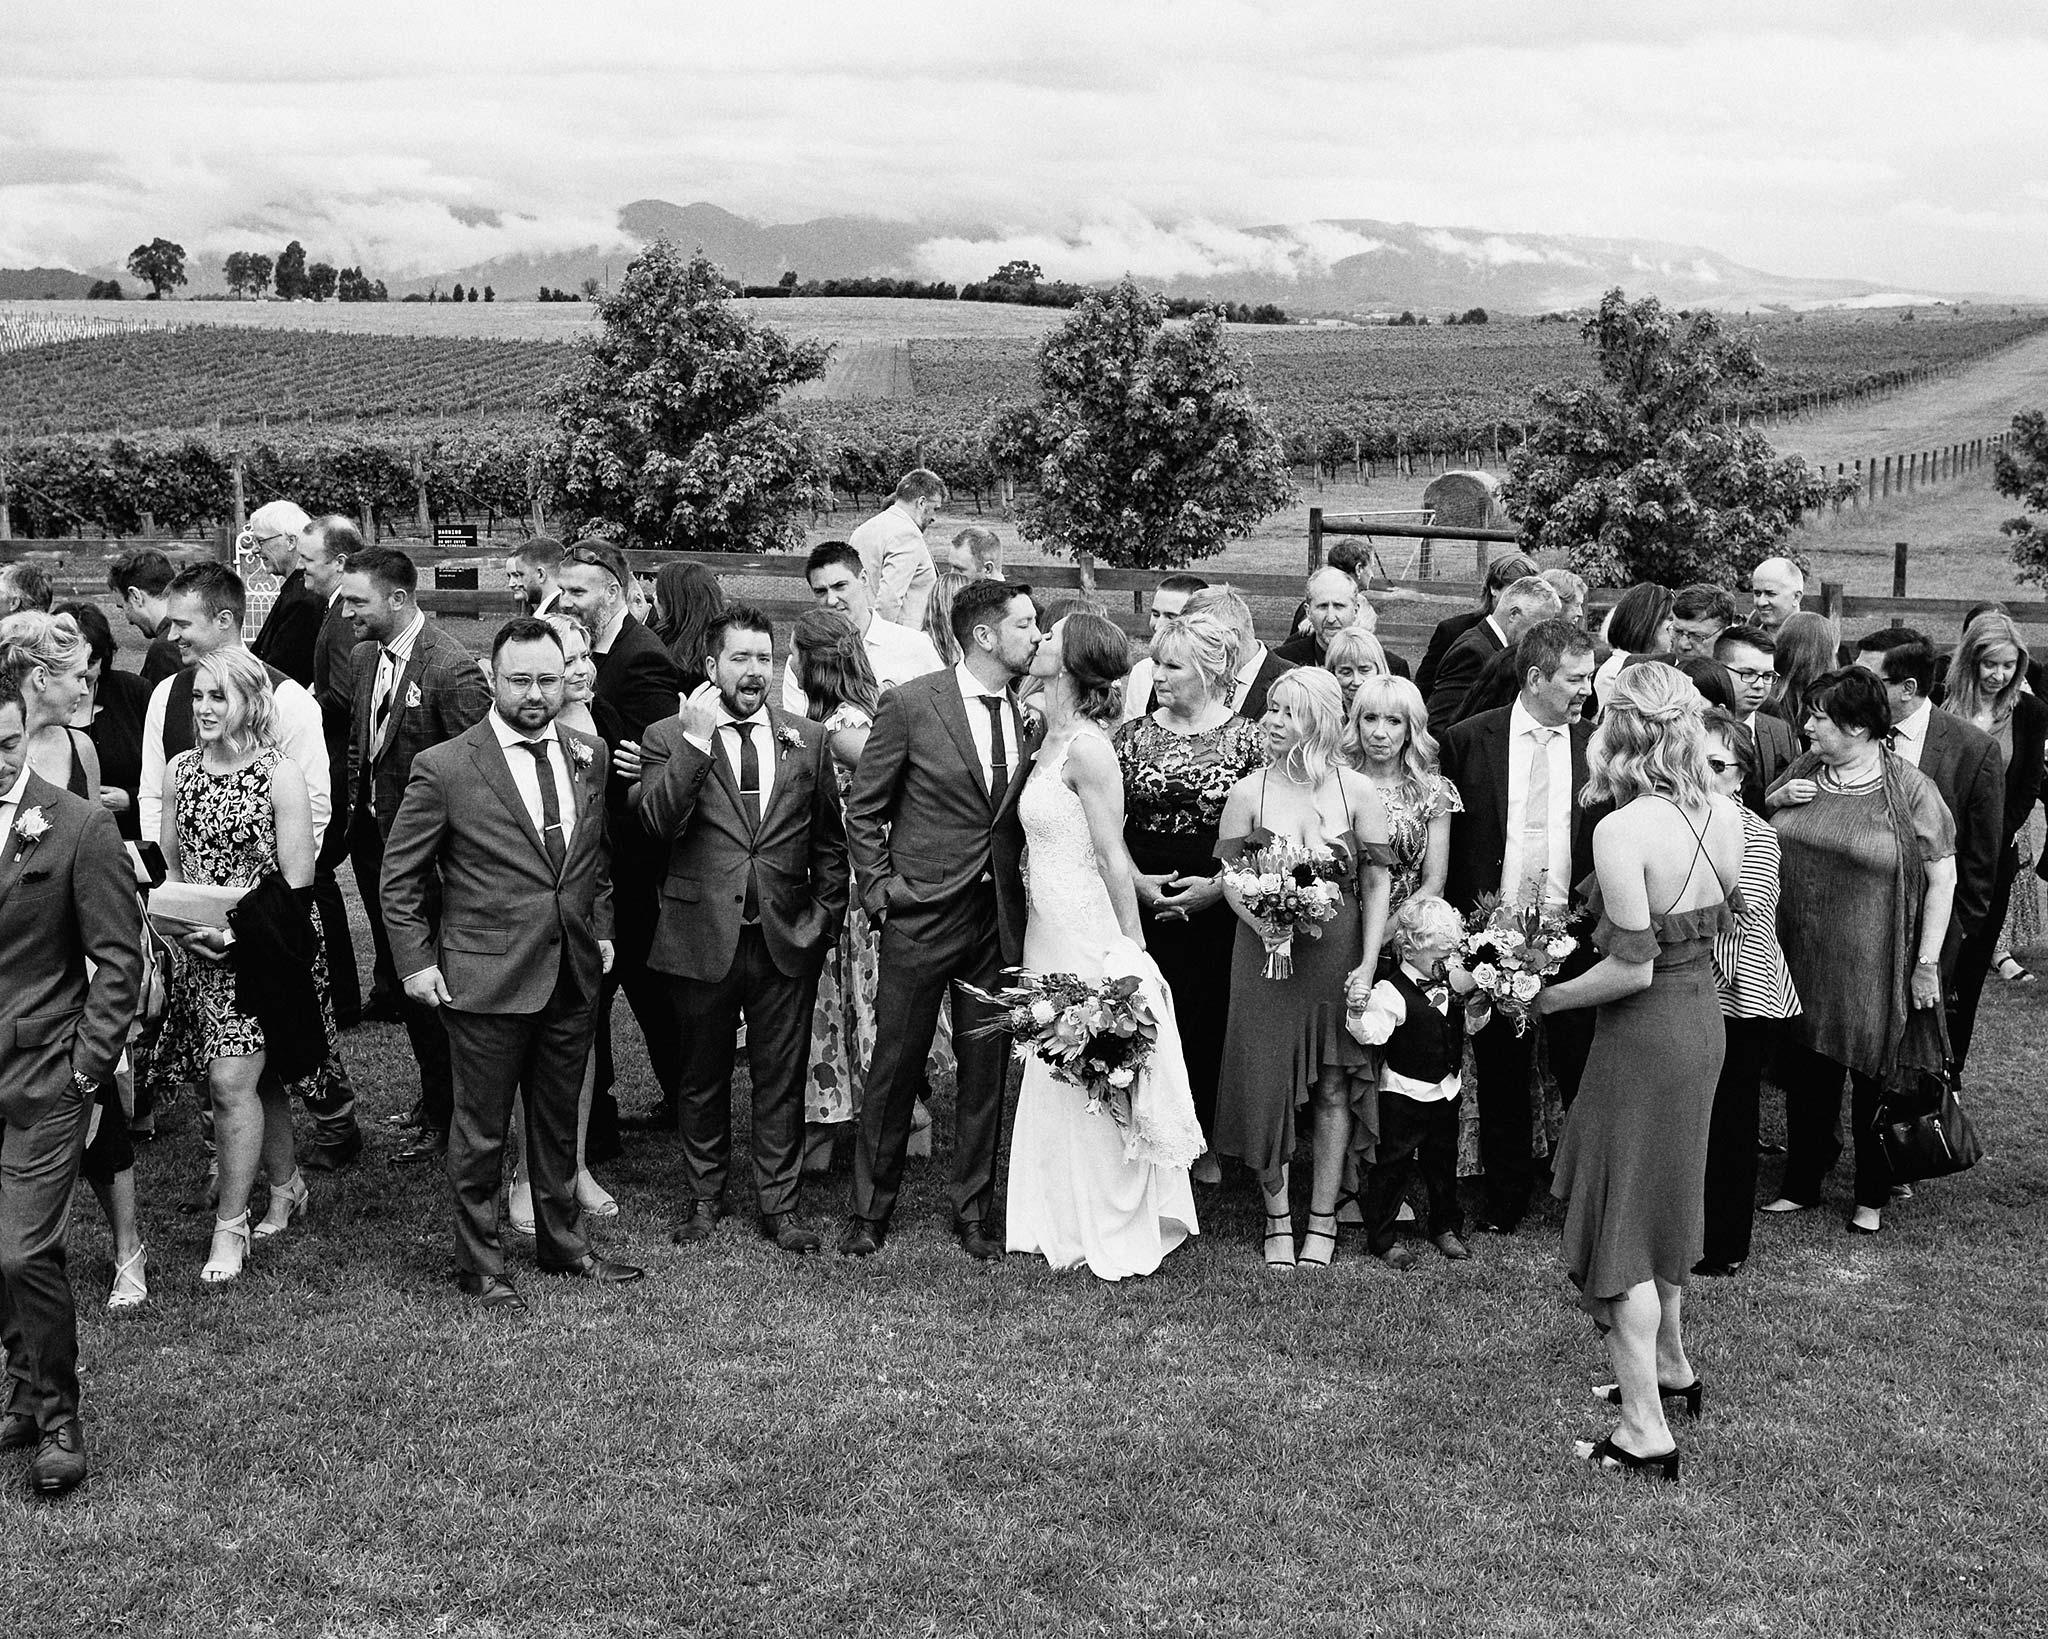 Zonzo estate wedding group shot